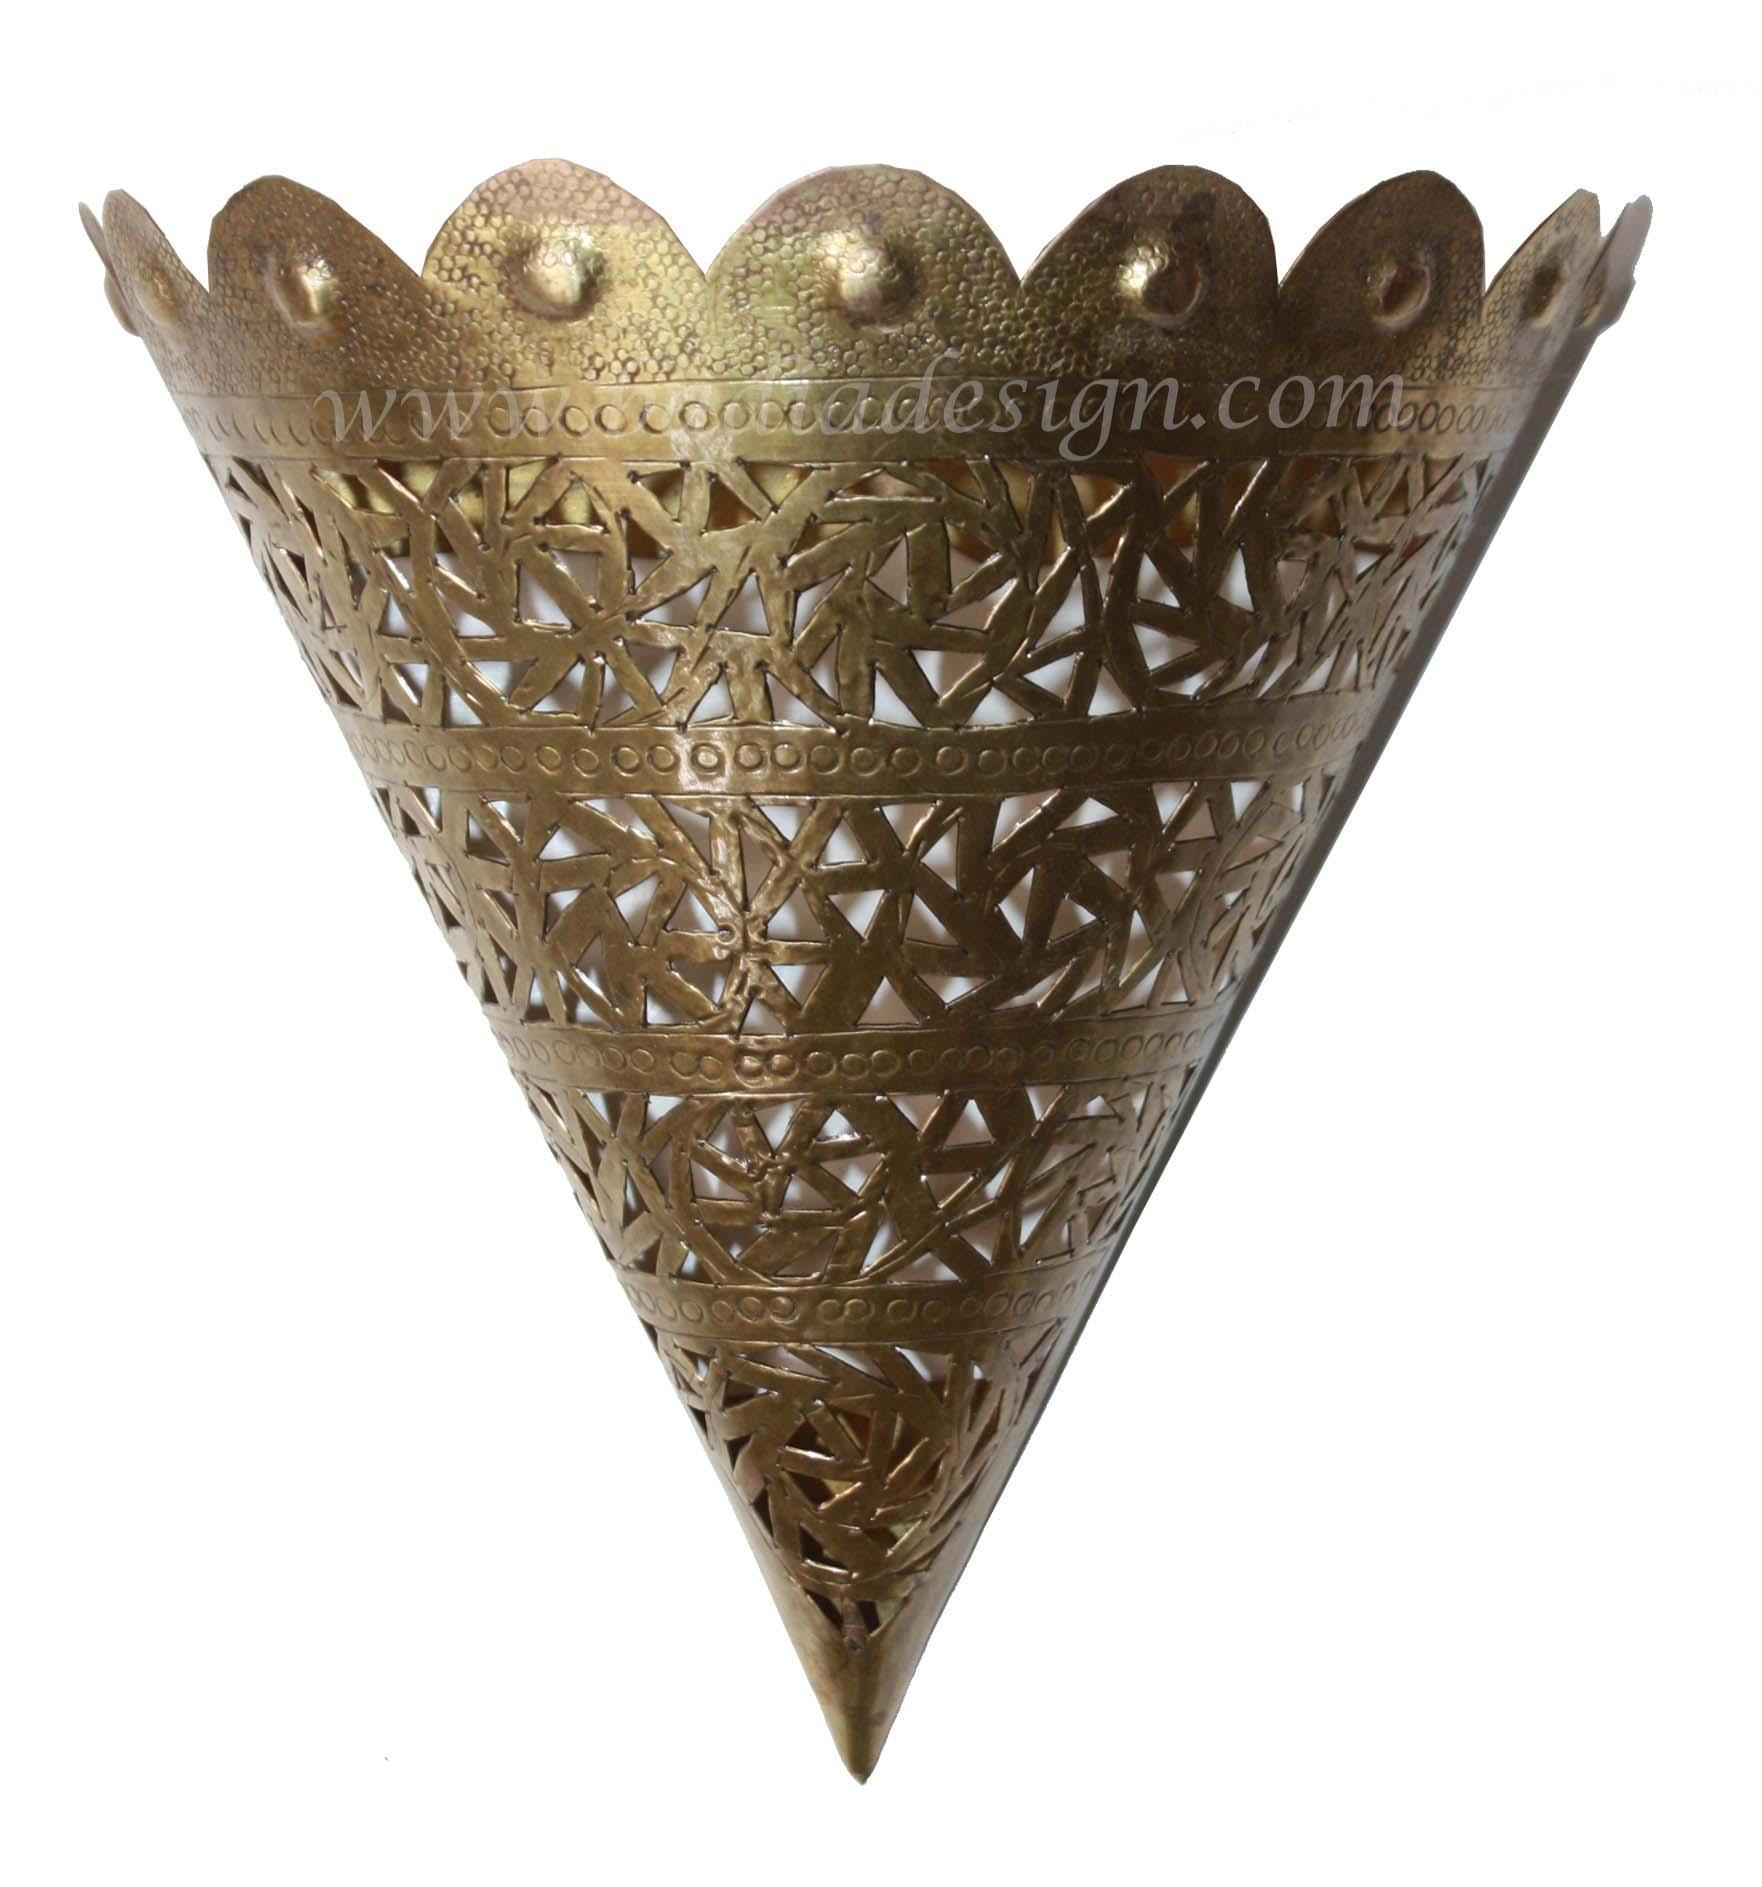 moroccan-brass-wall-sconce-wl165-1.jpg